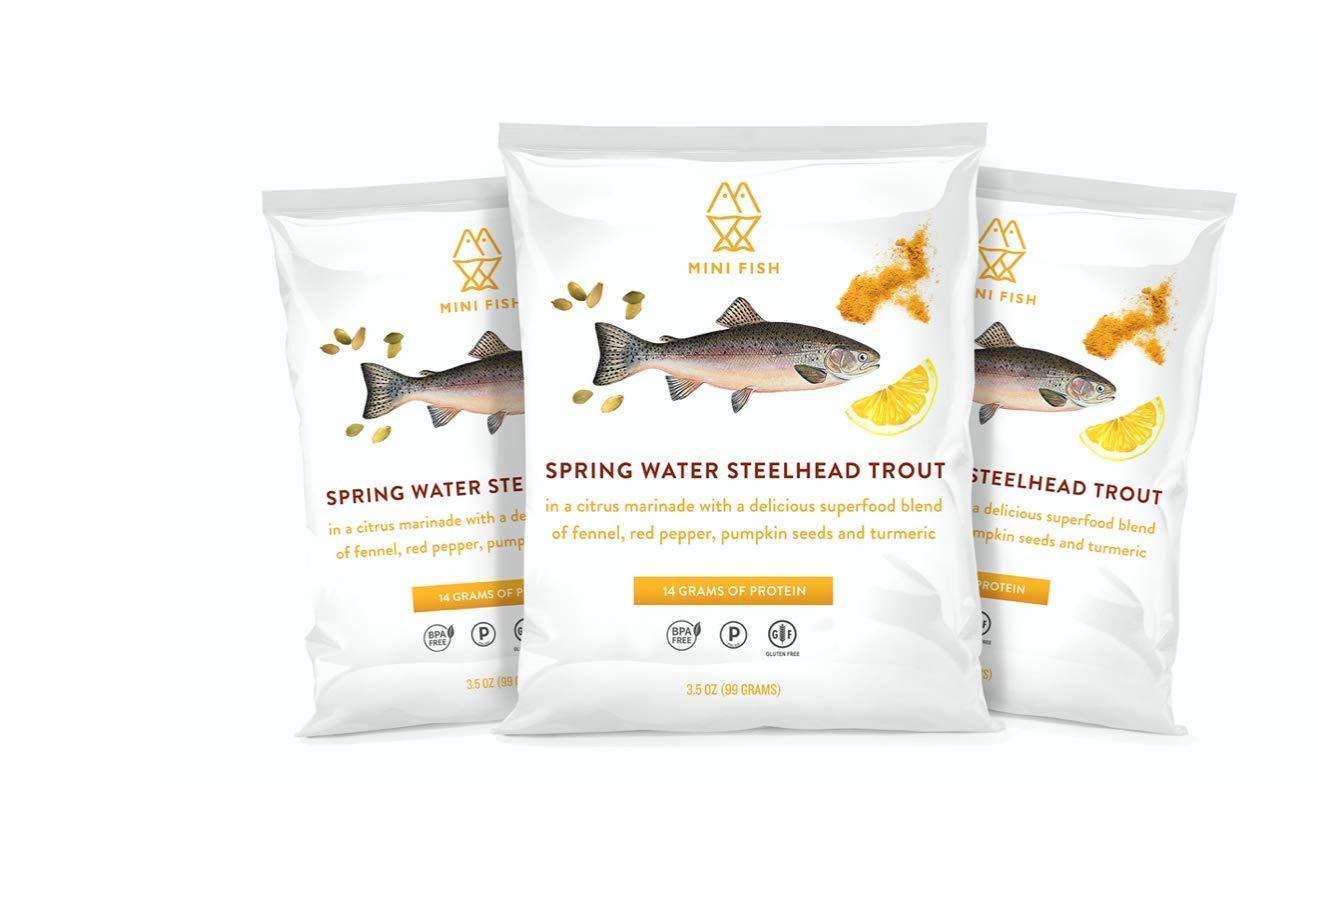 makuscha Streamer # 8 Sea-Rainbow-Salmon-Trout Arctic Char Sbirolino 3 St